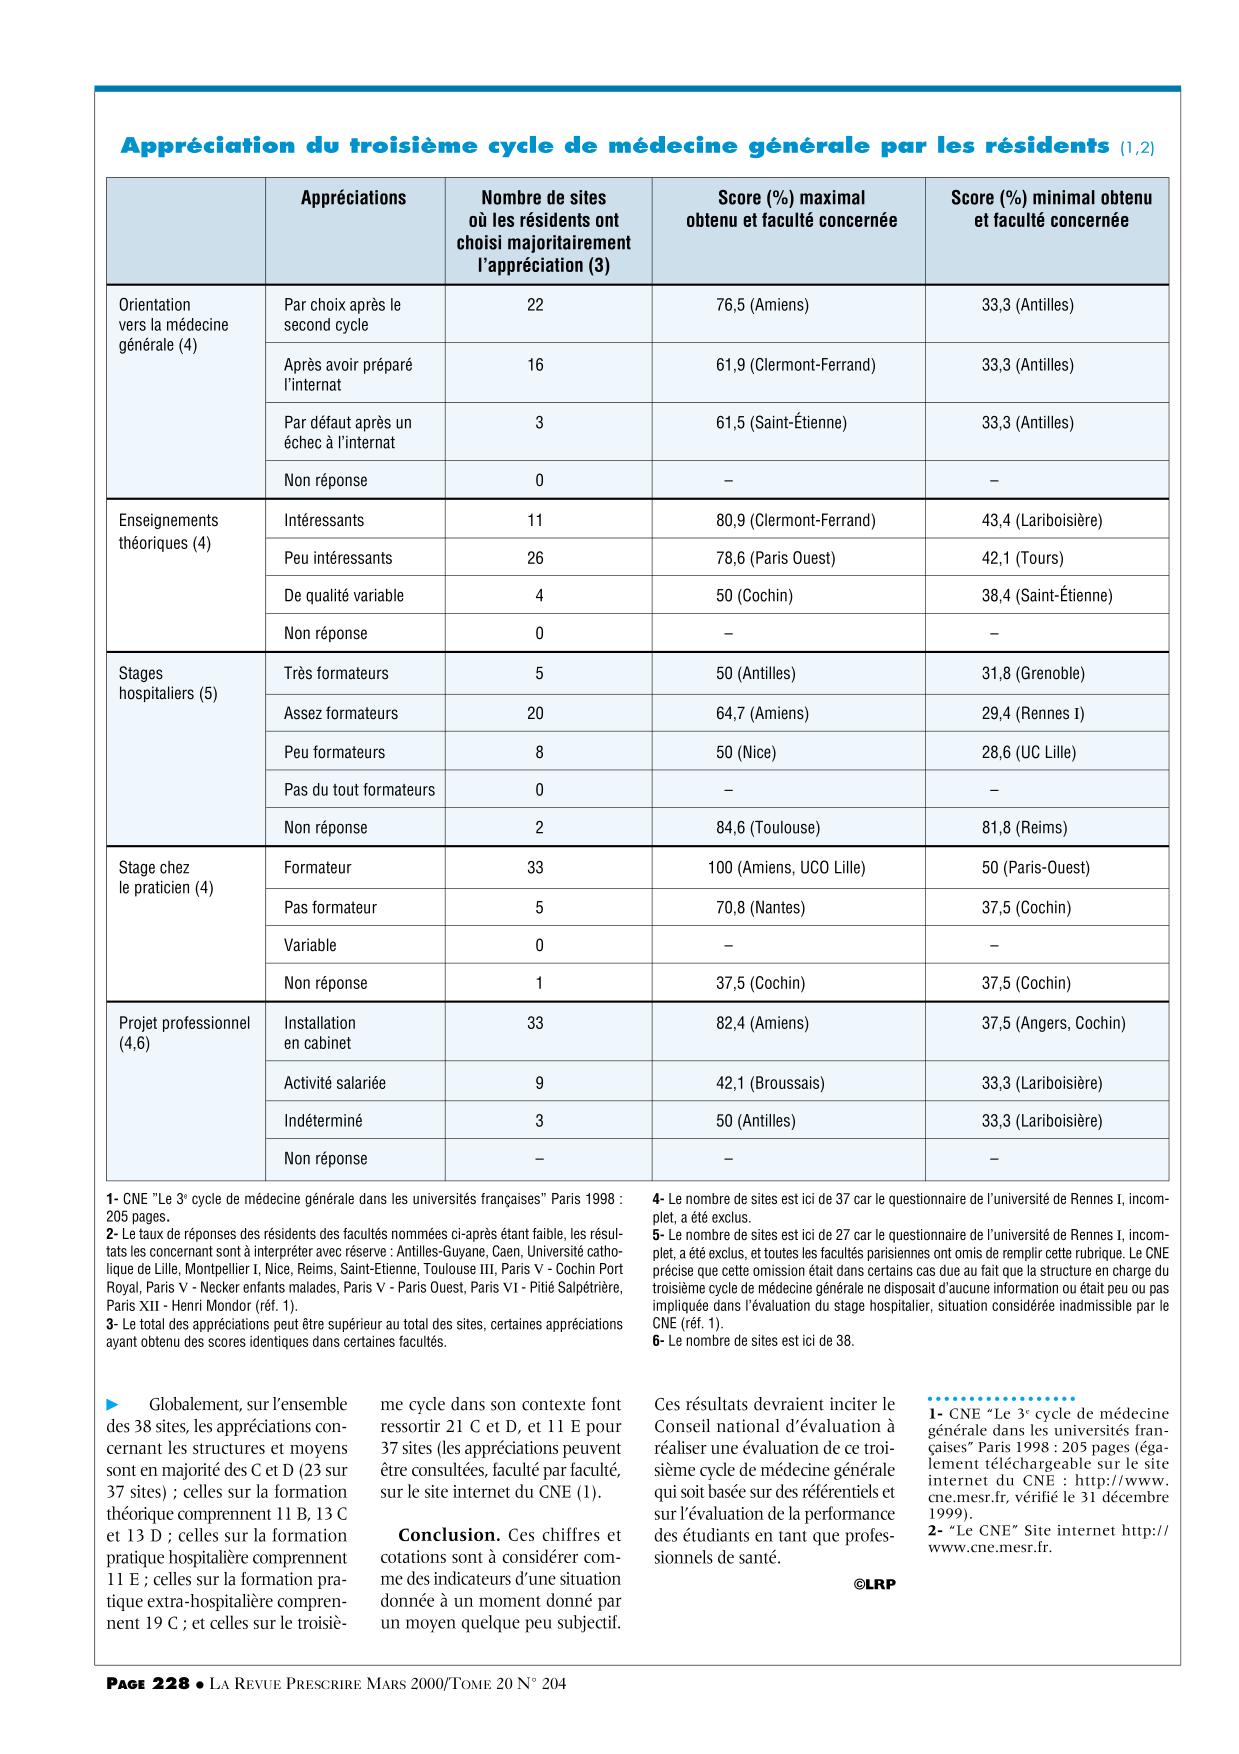 applidev prescrire org - /Images/data/LRP/204/standard/